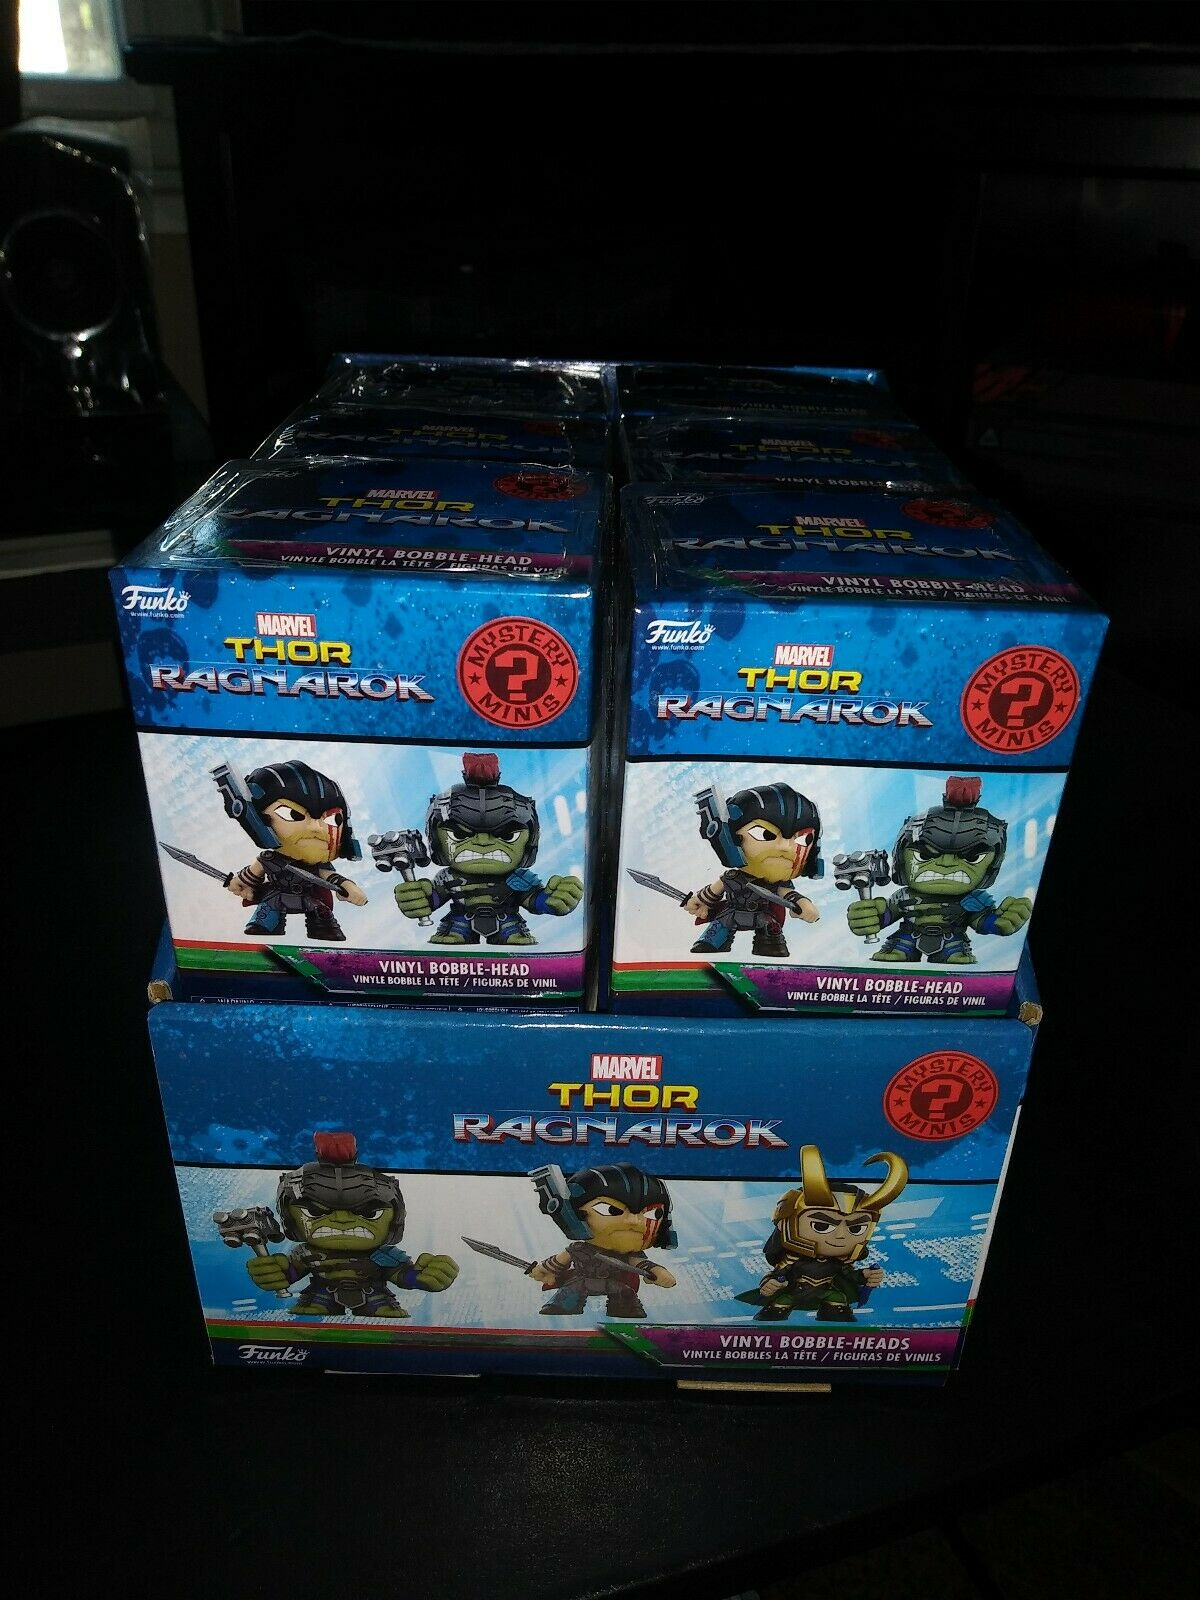 Funko Thor Ragnarok Mystery Minis Minis Minis Display Case of 12 Blind Box Figures 6a531d